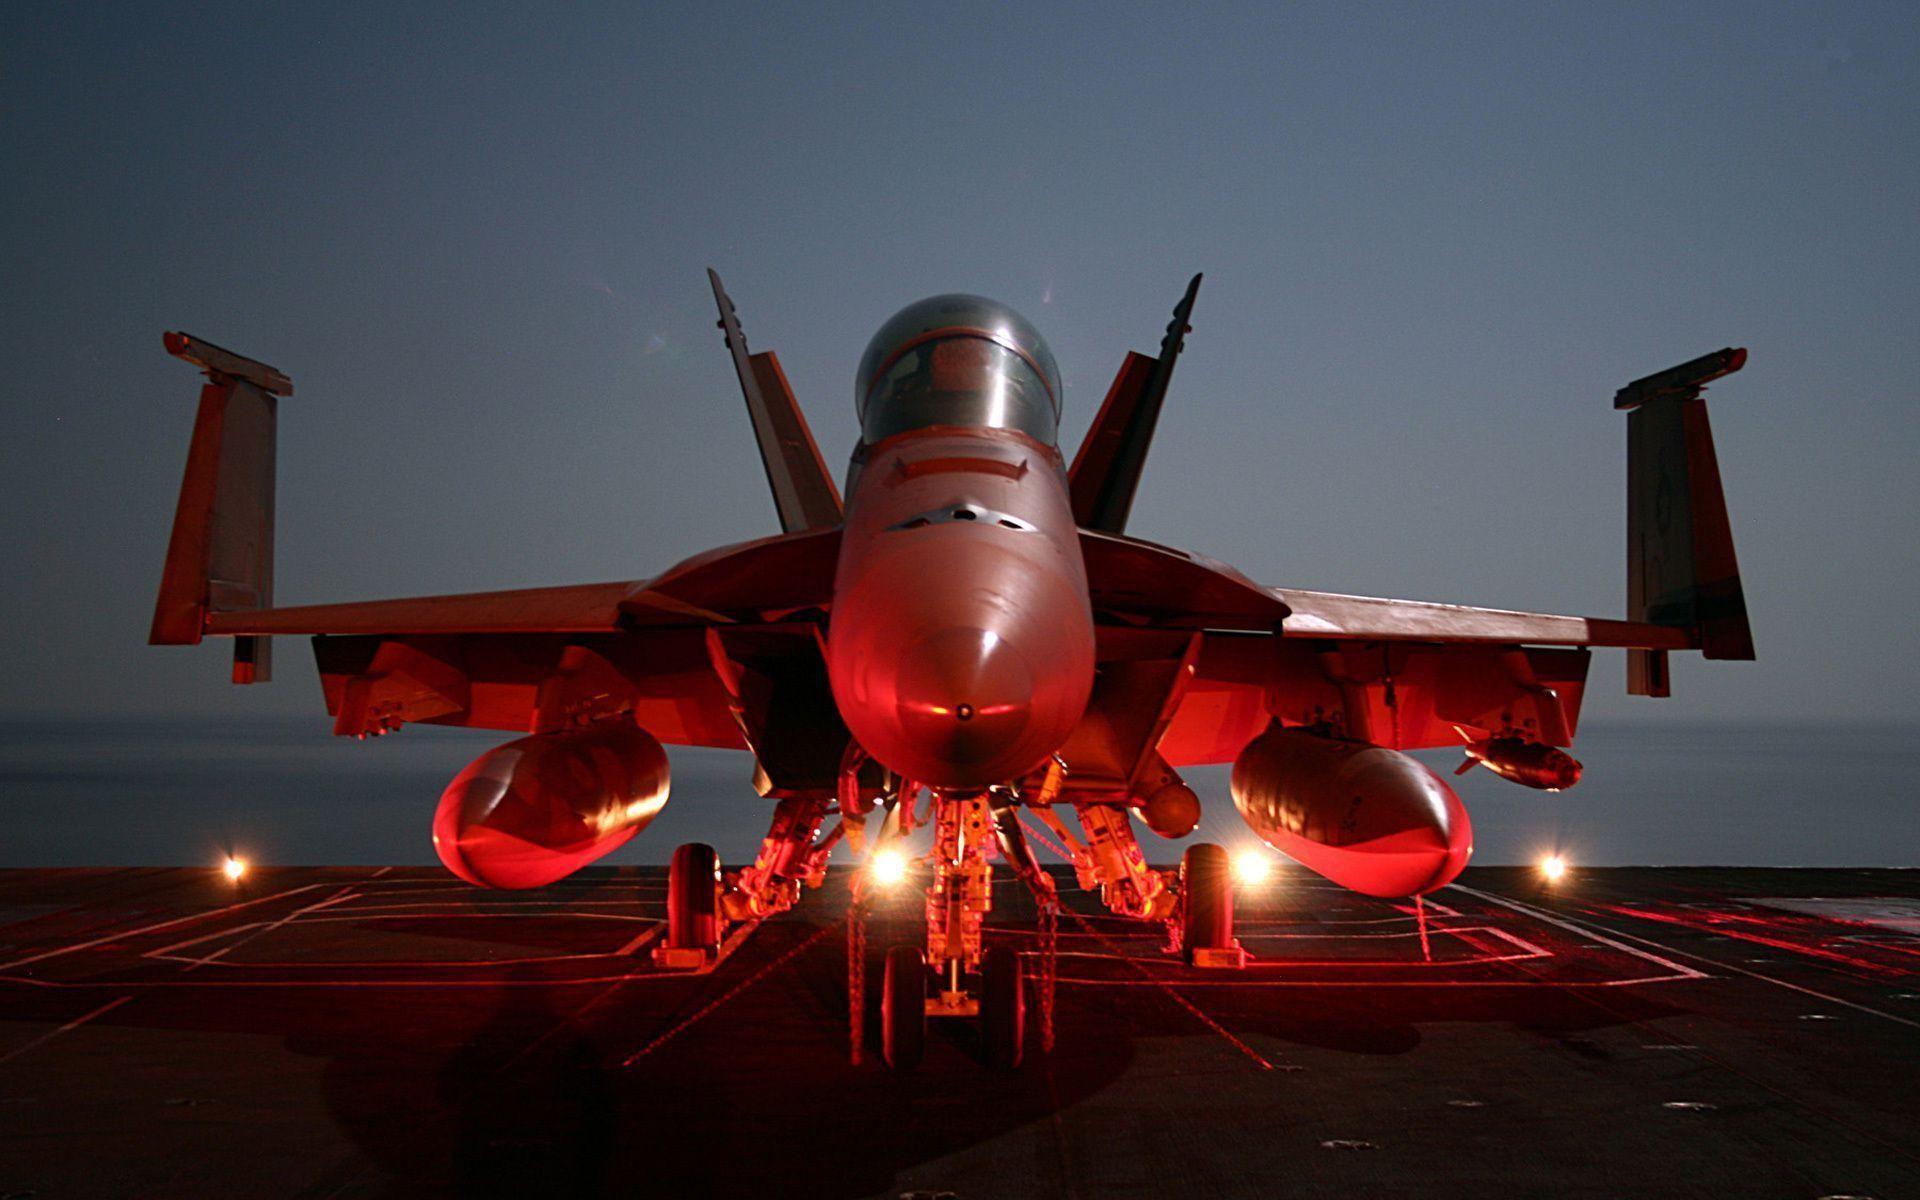 Flying Aces: Navy Pilot Simulator (VR)